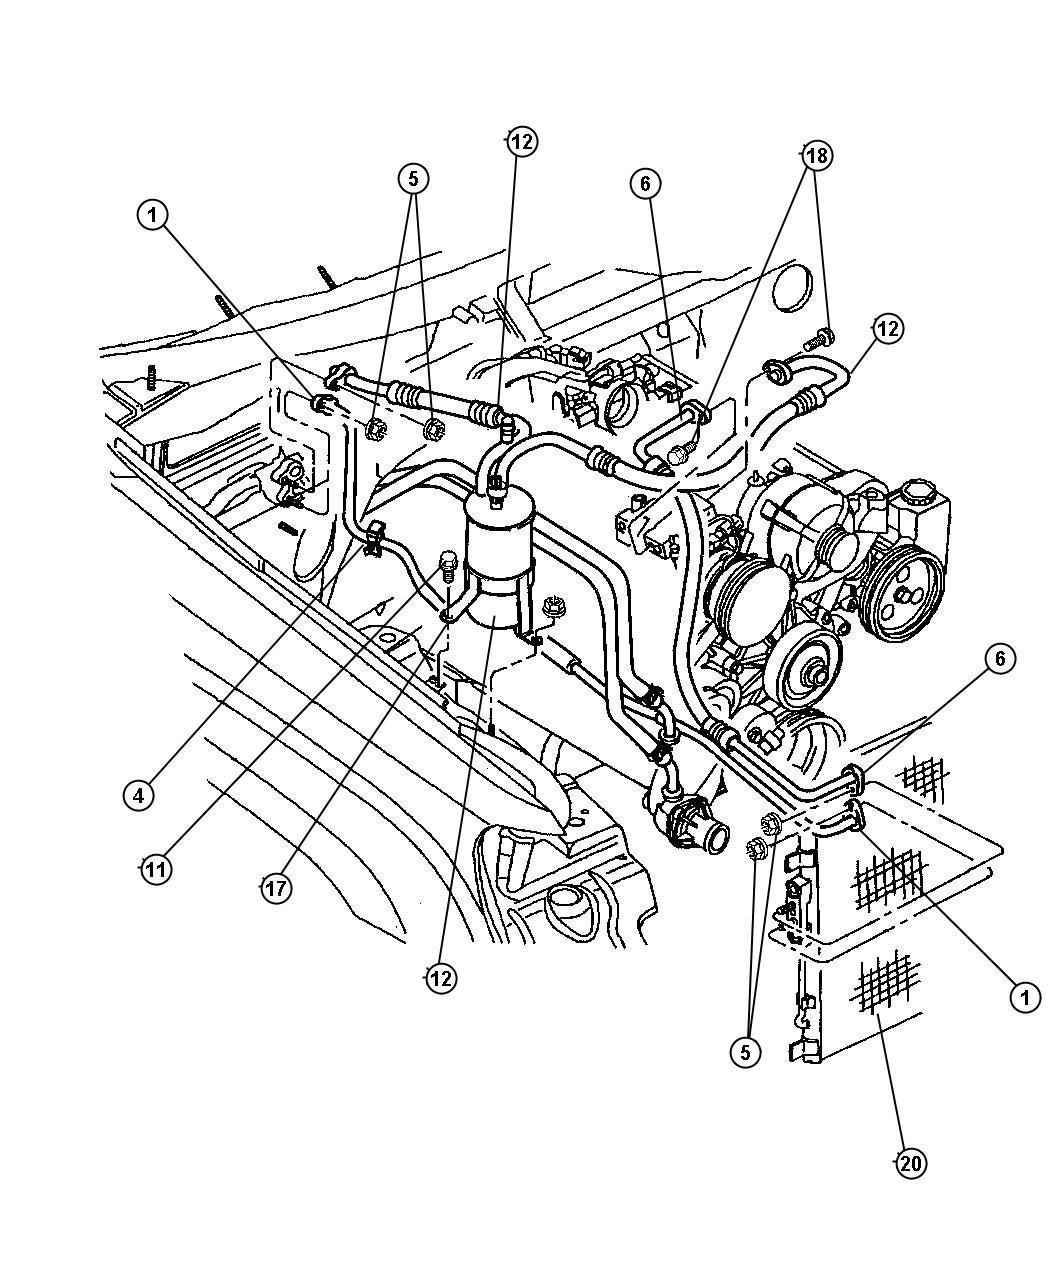 2000 Dodge Durango Line. A/c liquid. Air, lines, condenser